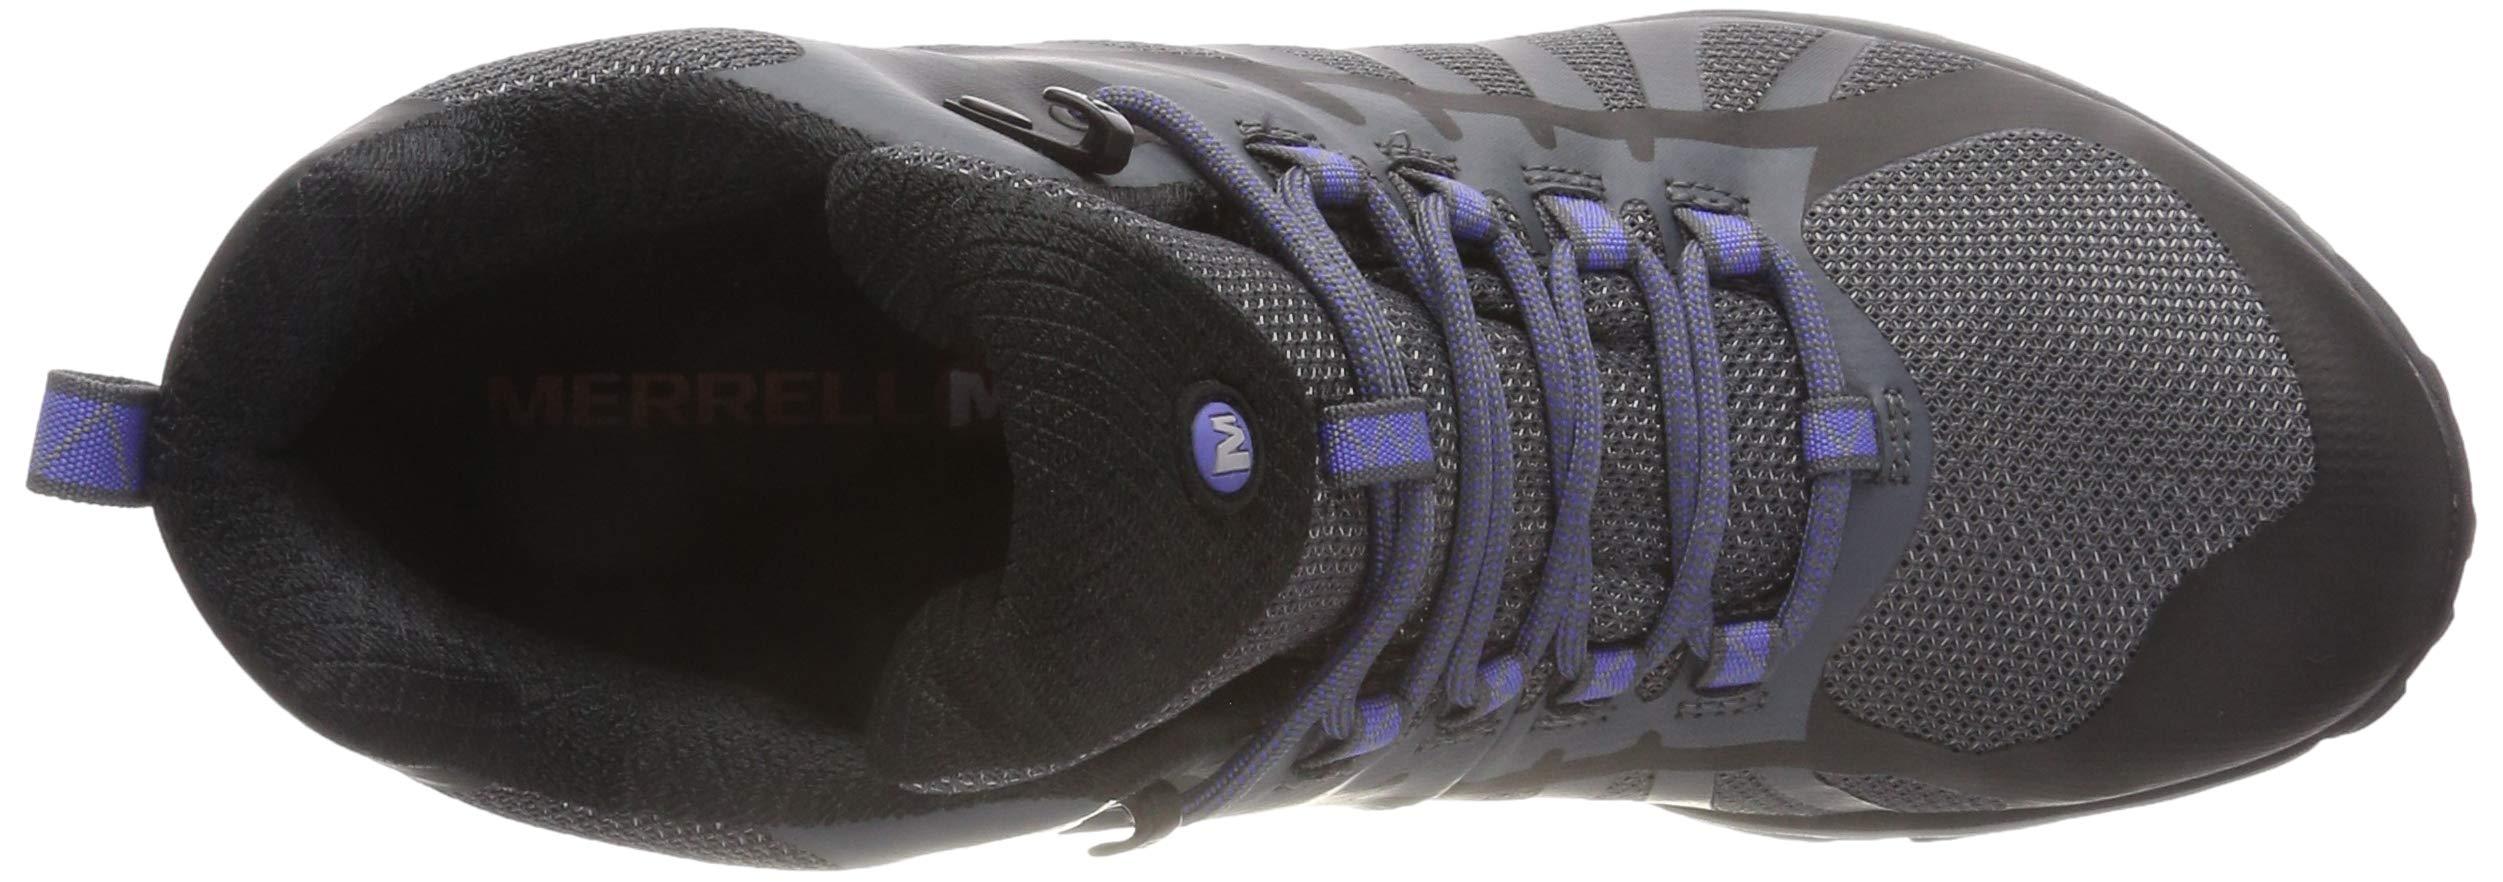 71qVXR8dbRL - Merrell Women's Siren Edge Q2 Mid Wp High Rise Hiking Boots